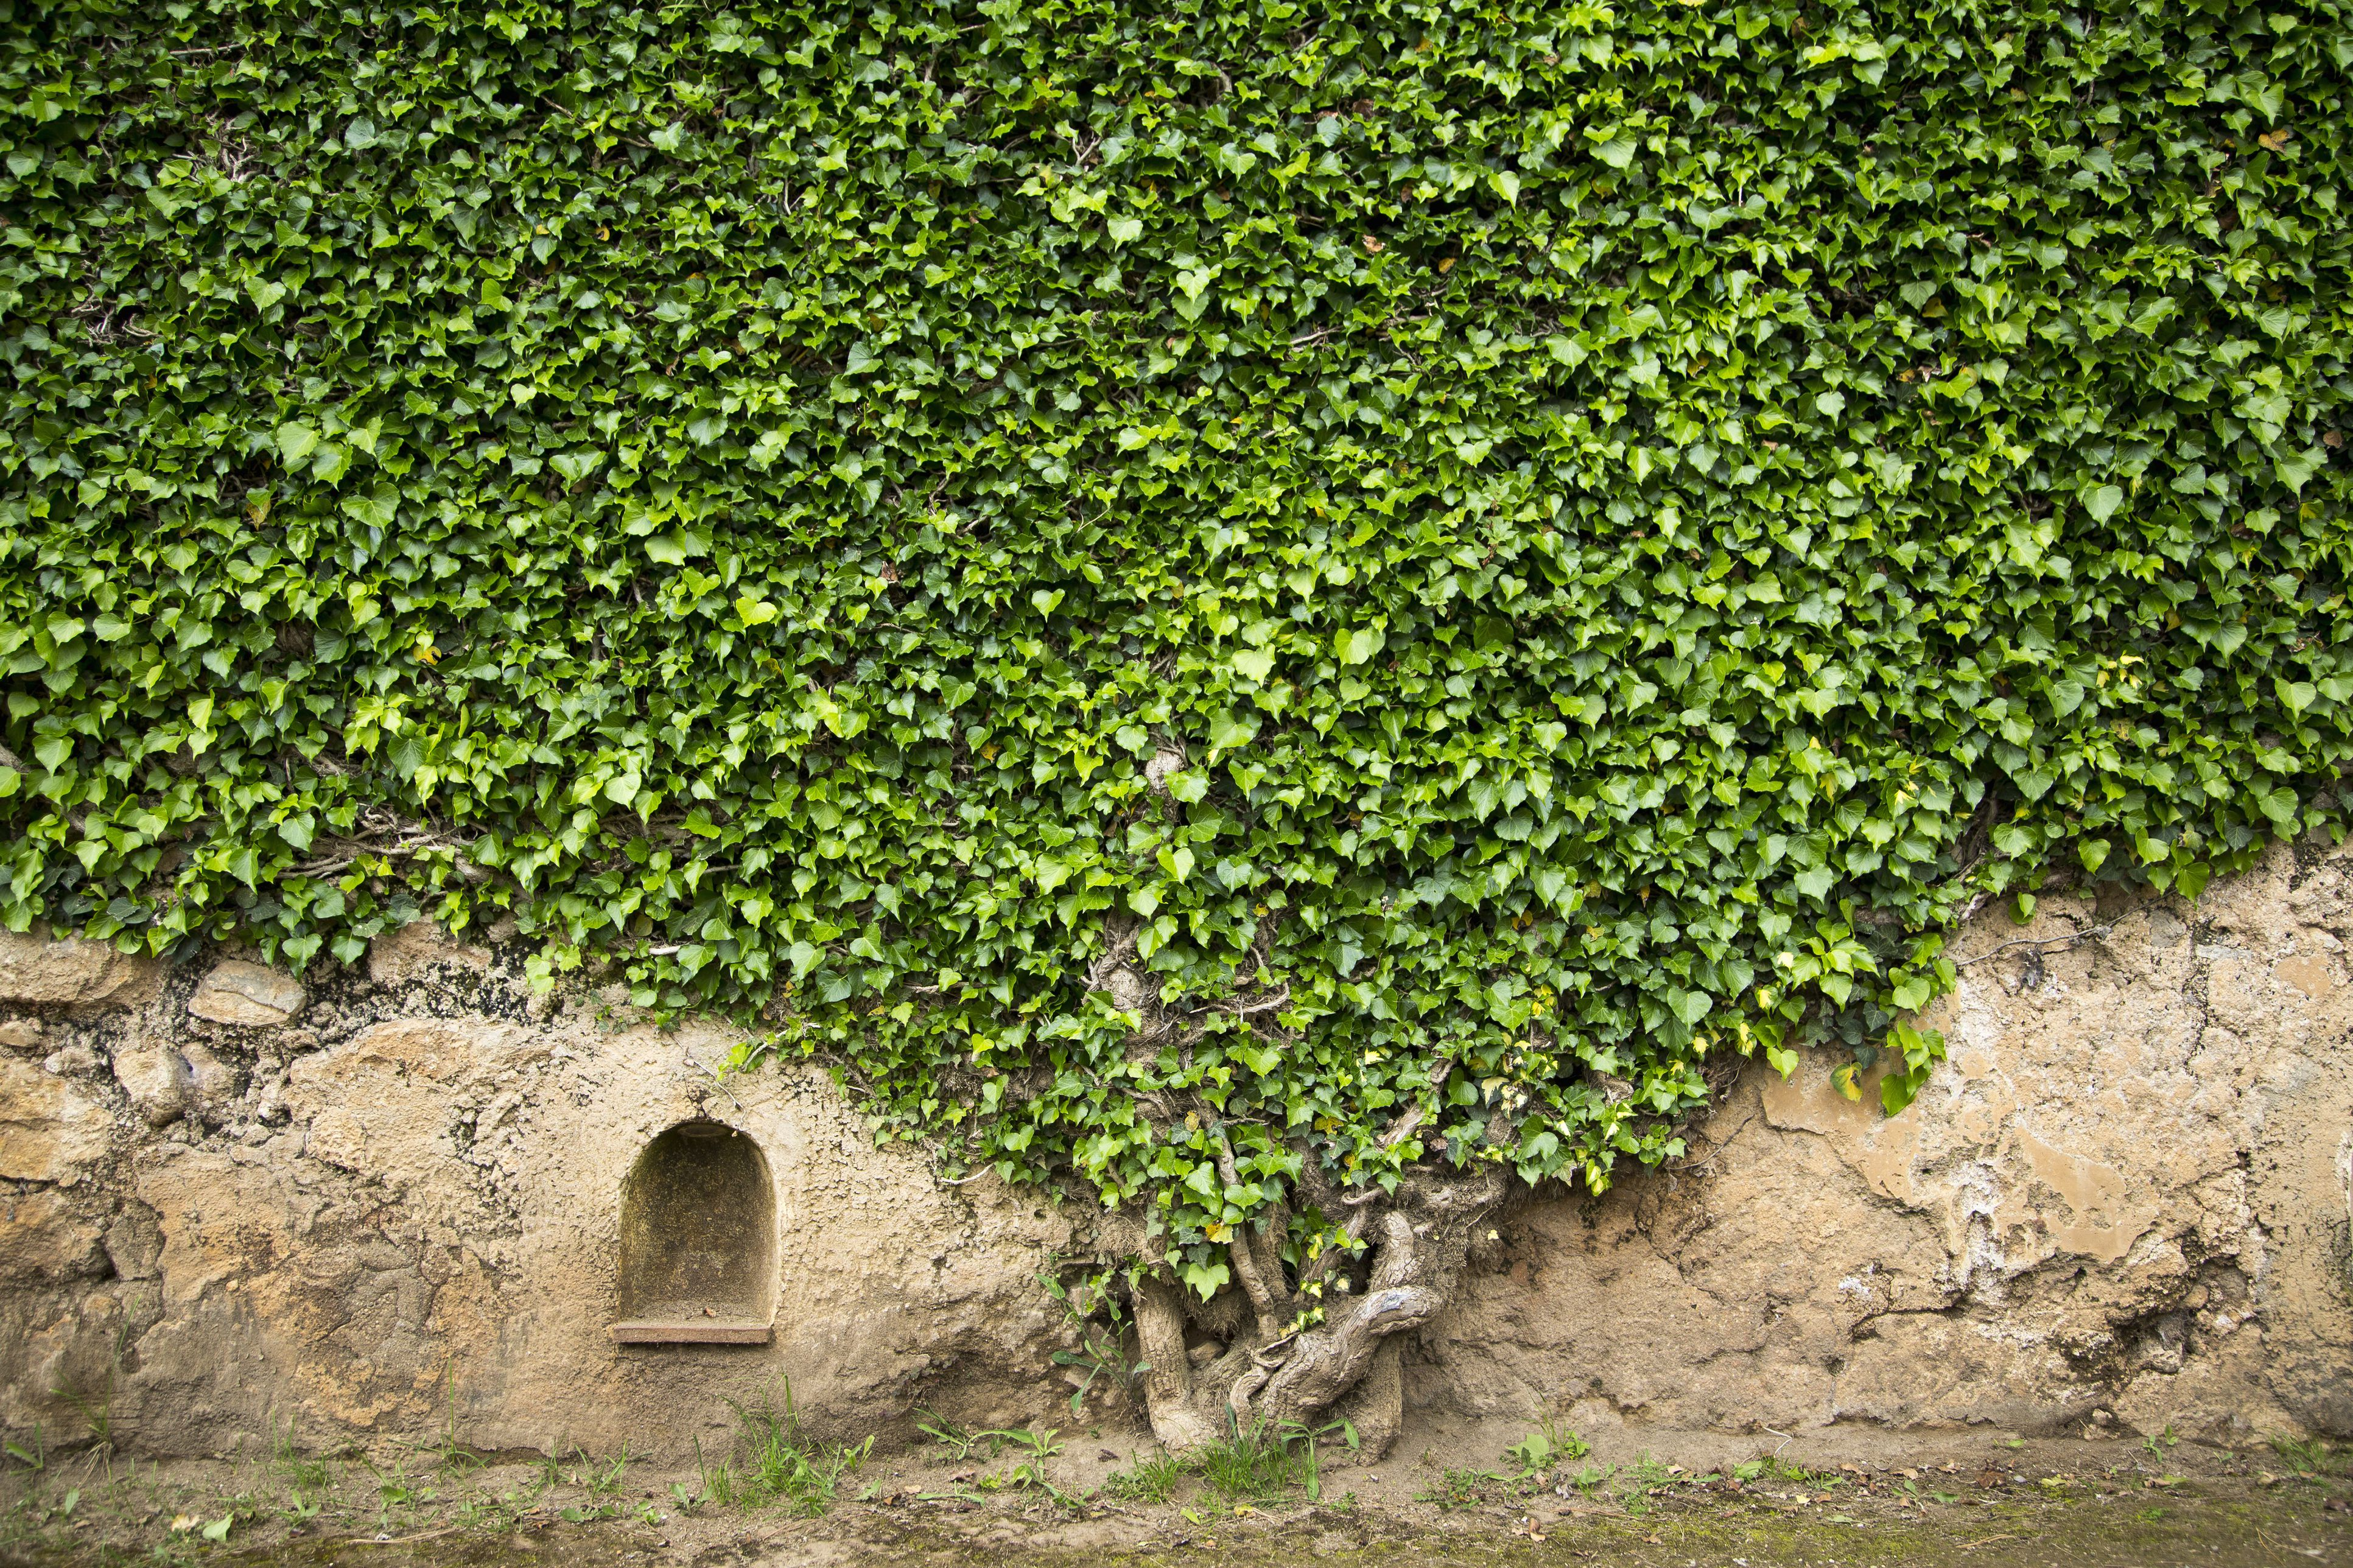 Ivy on a wall of Villa Cimbrone, Ravello